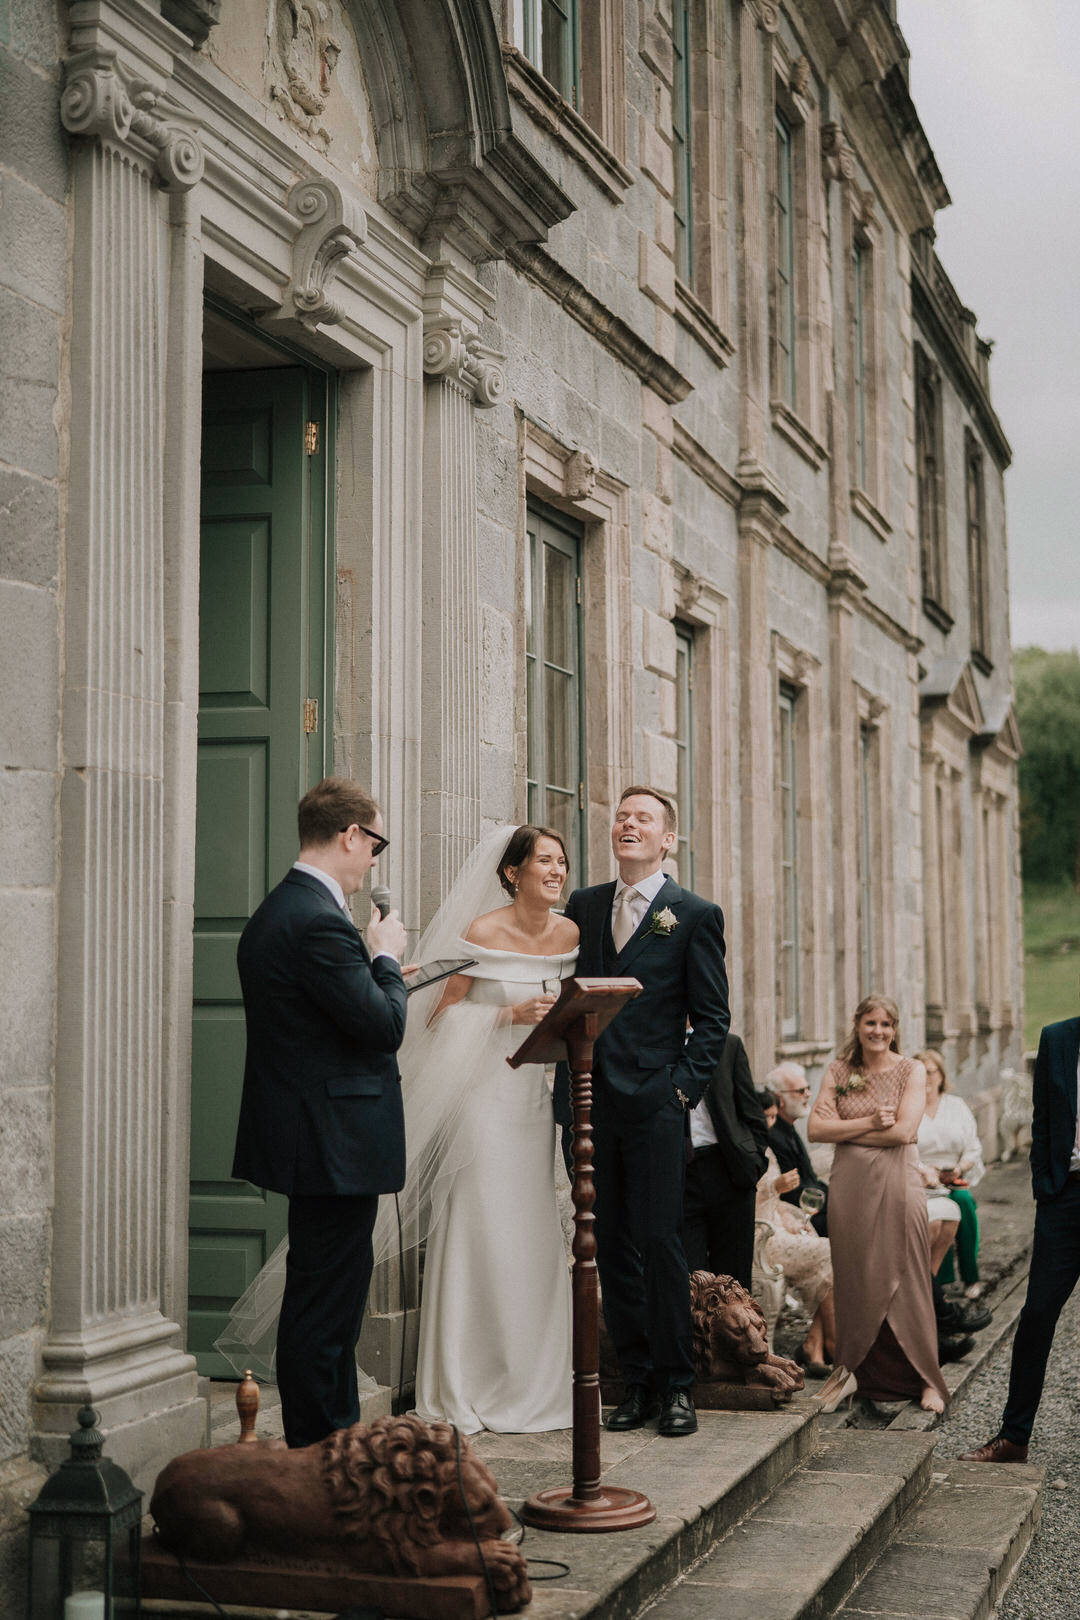 Gloster-House-wedding-photos17 17